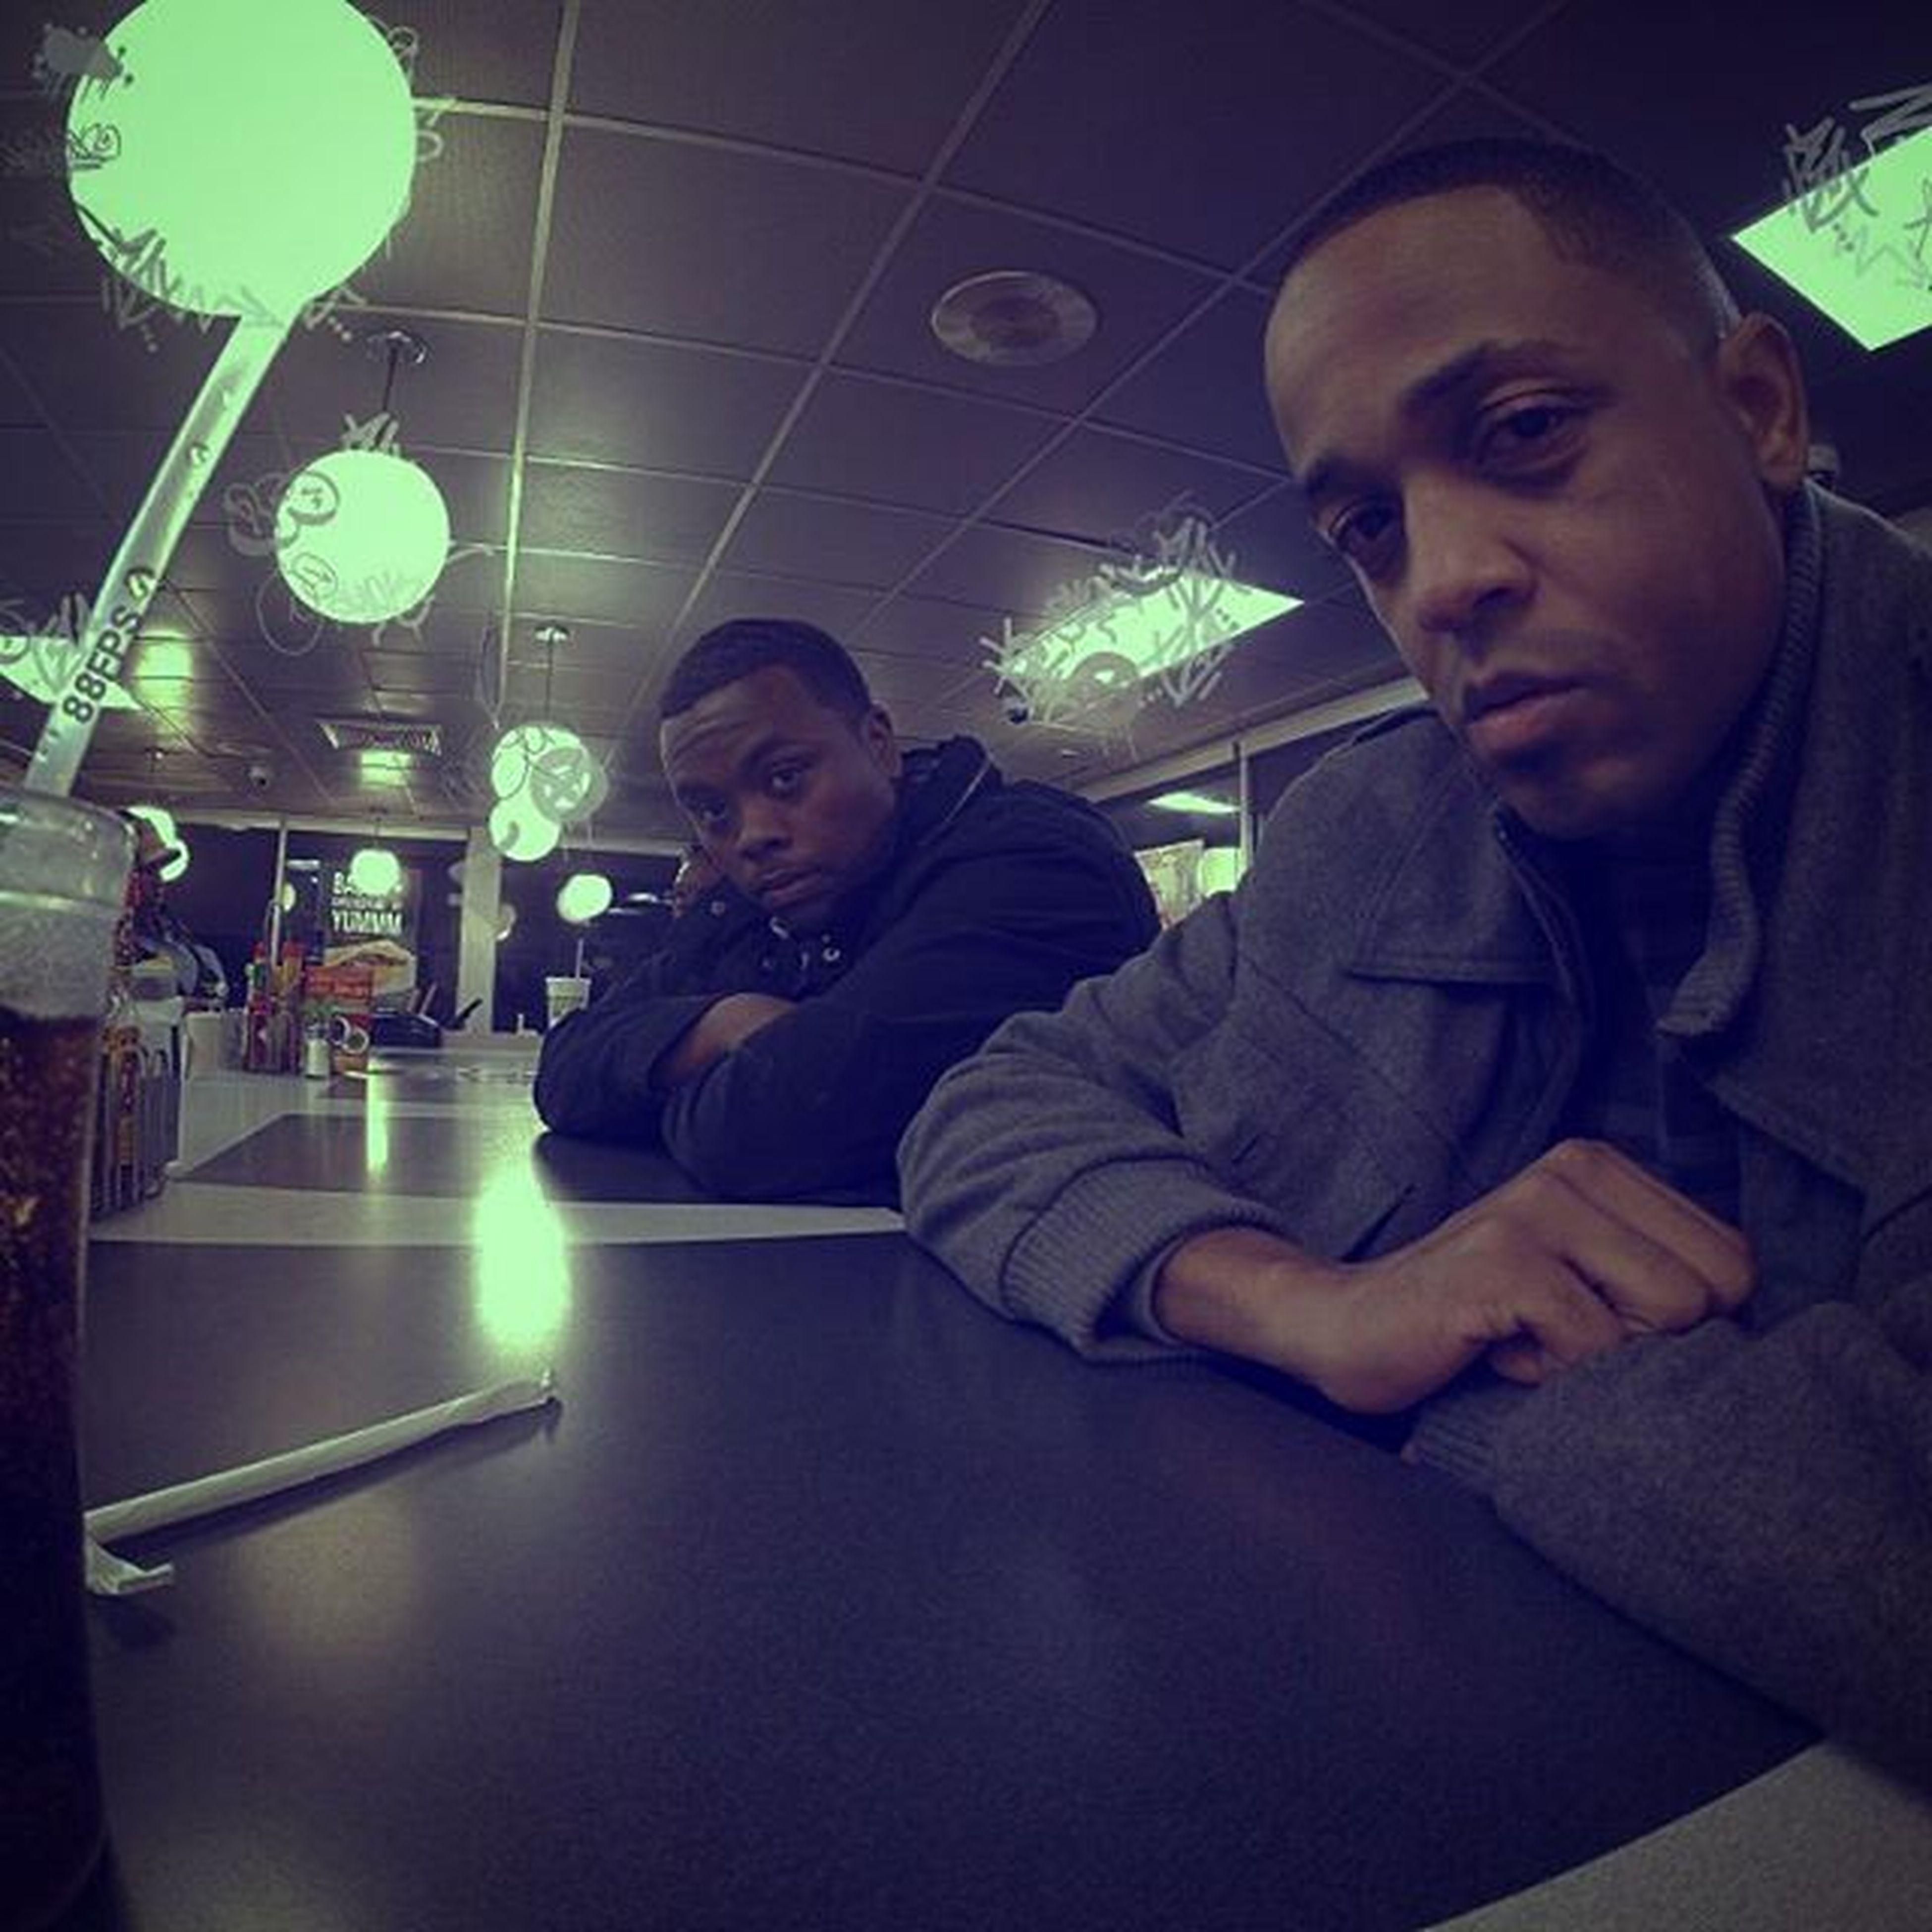 1:40 am.... With the homie @itsdez88